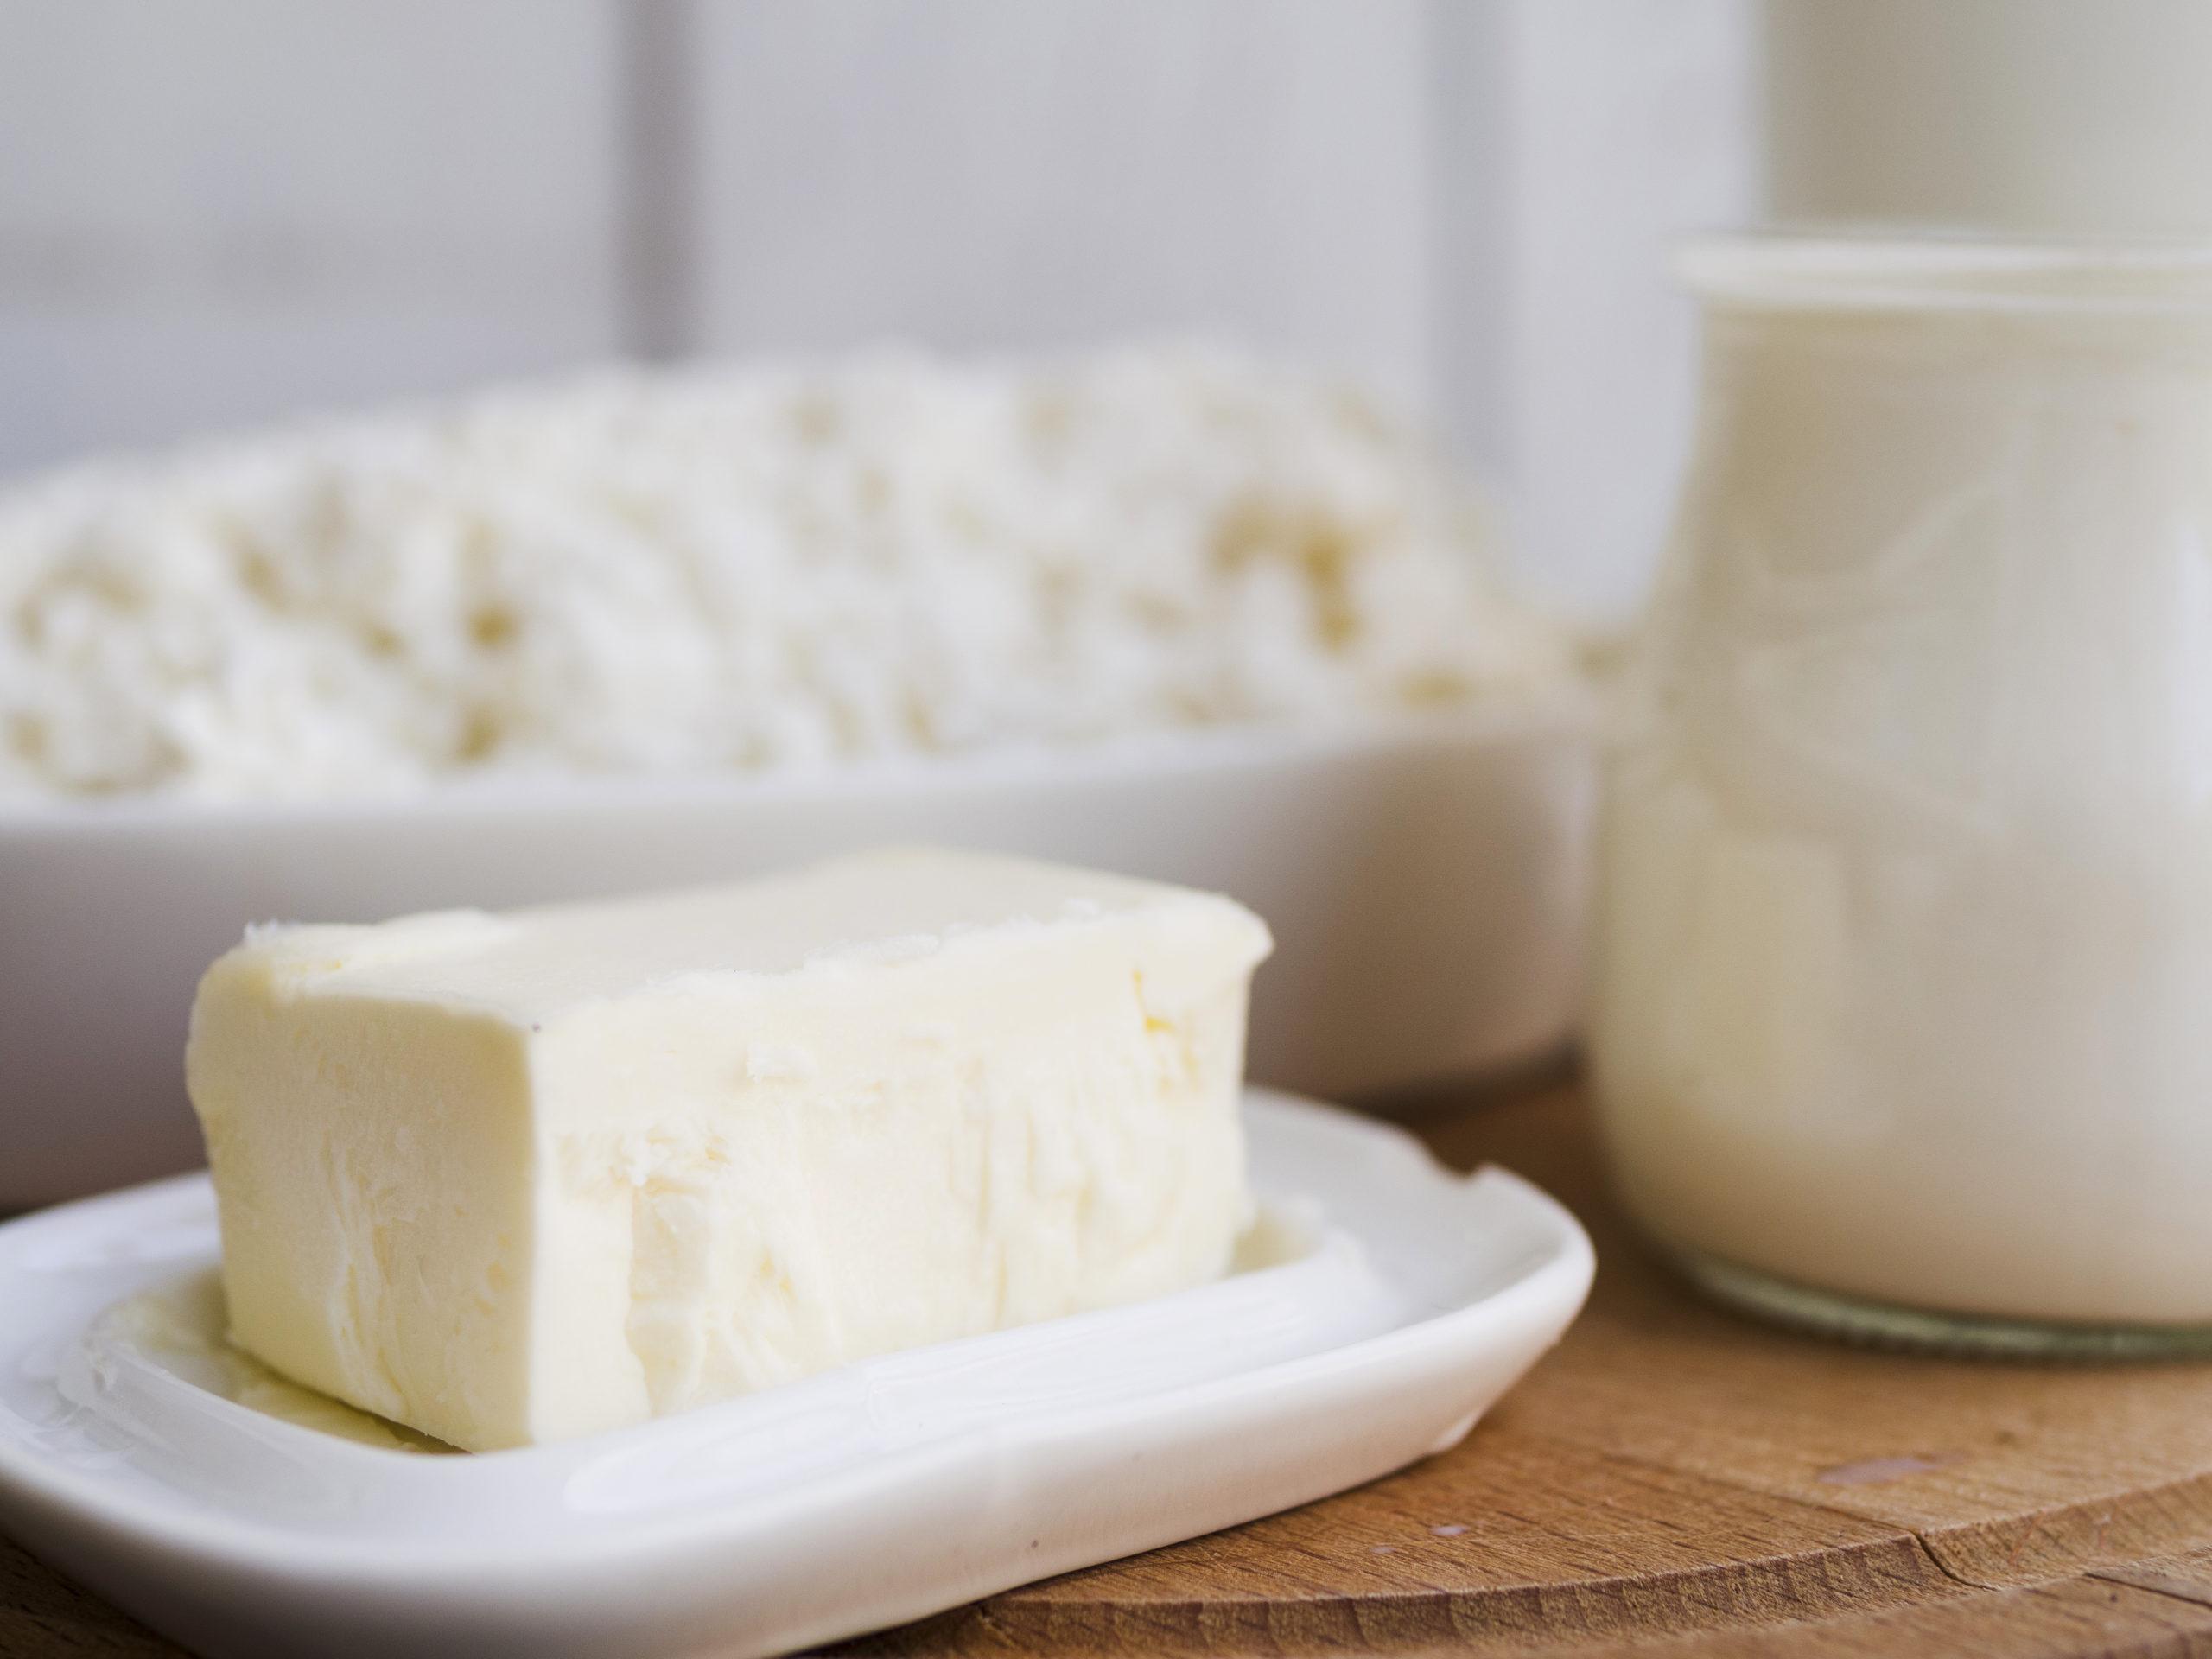 Beurre-matière grasse